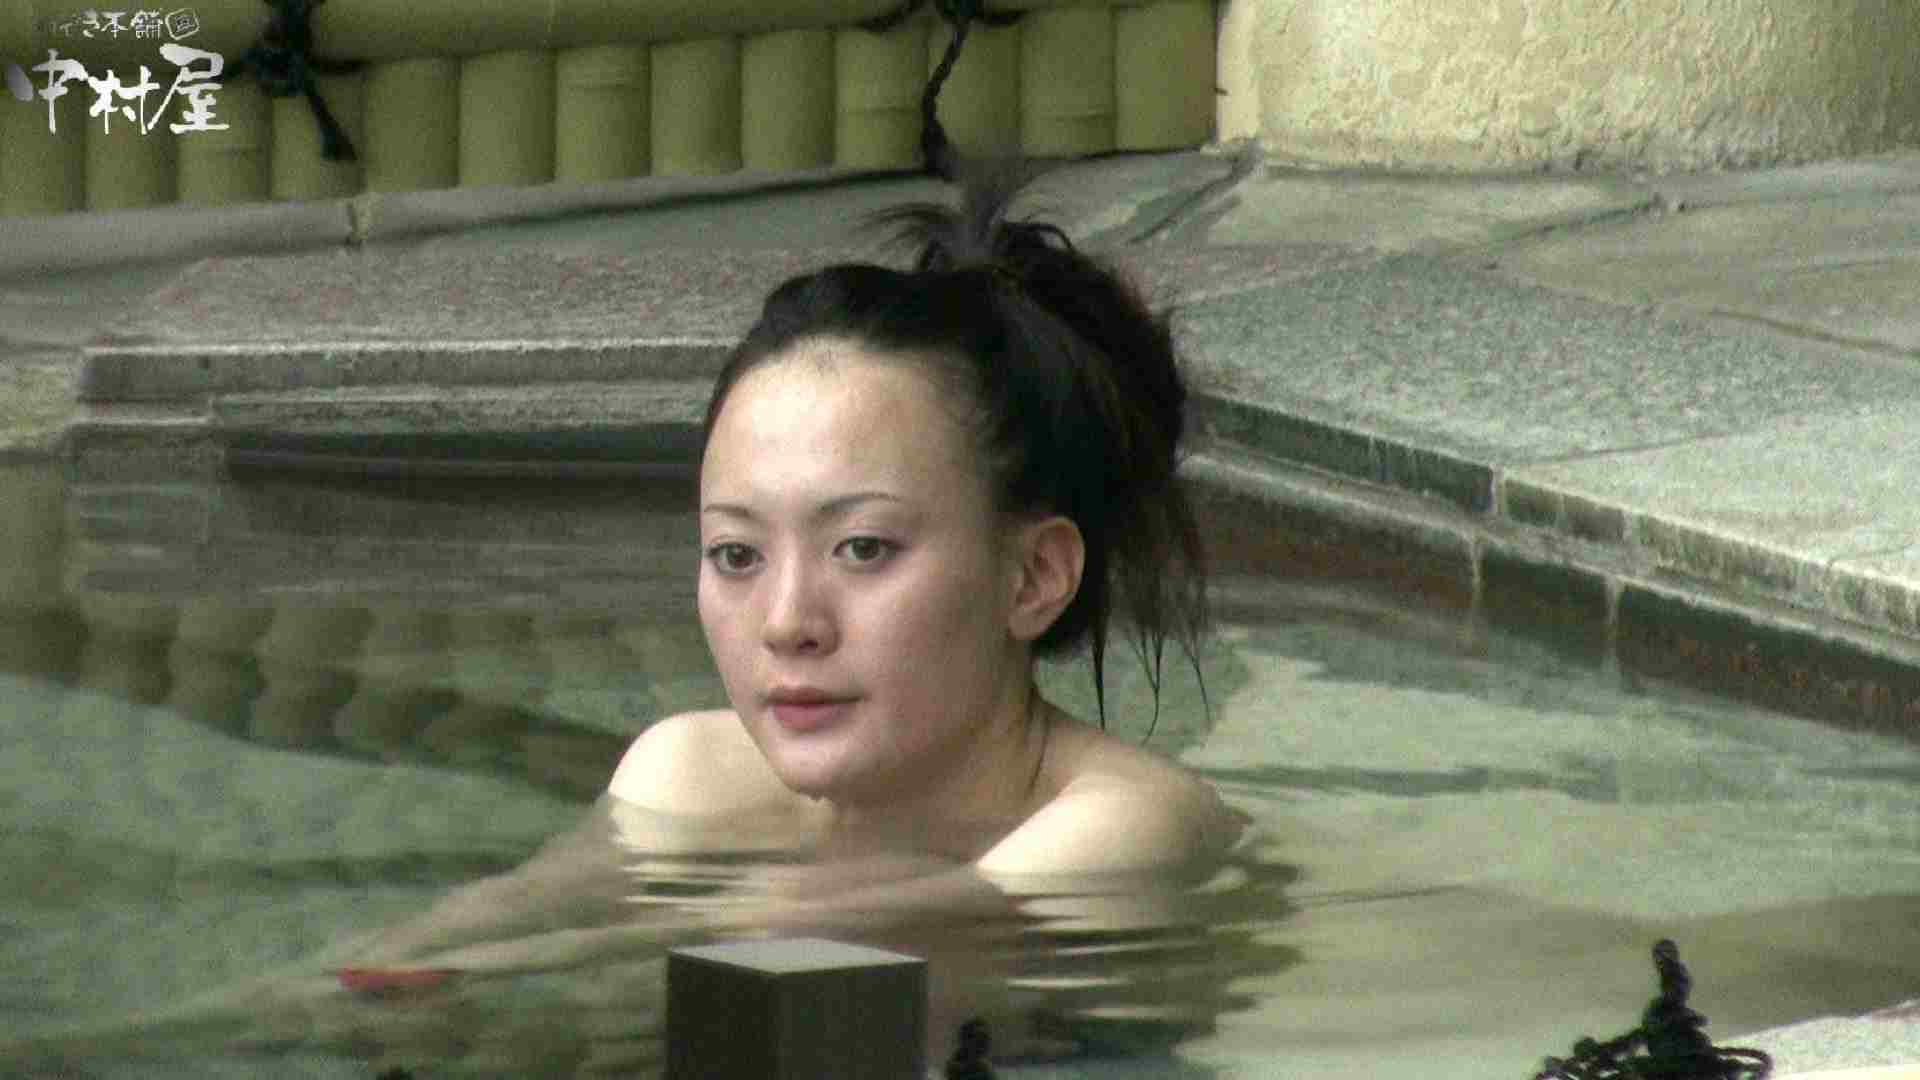 Aquaな露天風呂Vol.900 盗撮師作品 ヌード画像 86pic 50